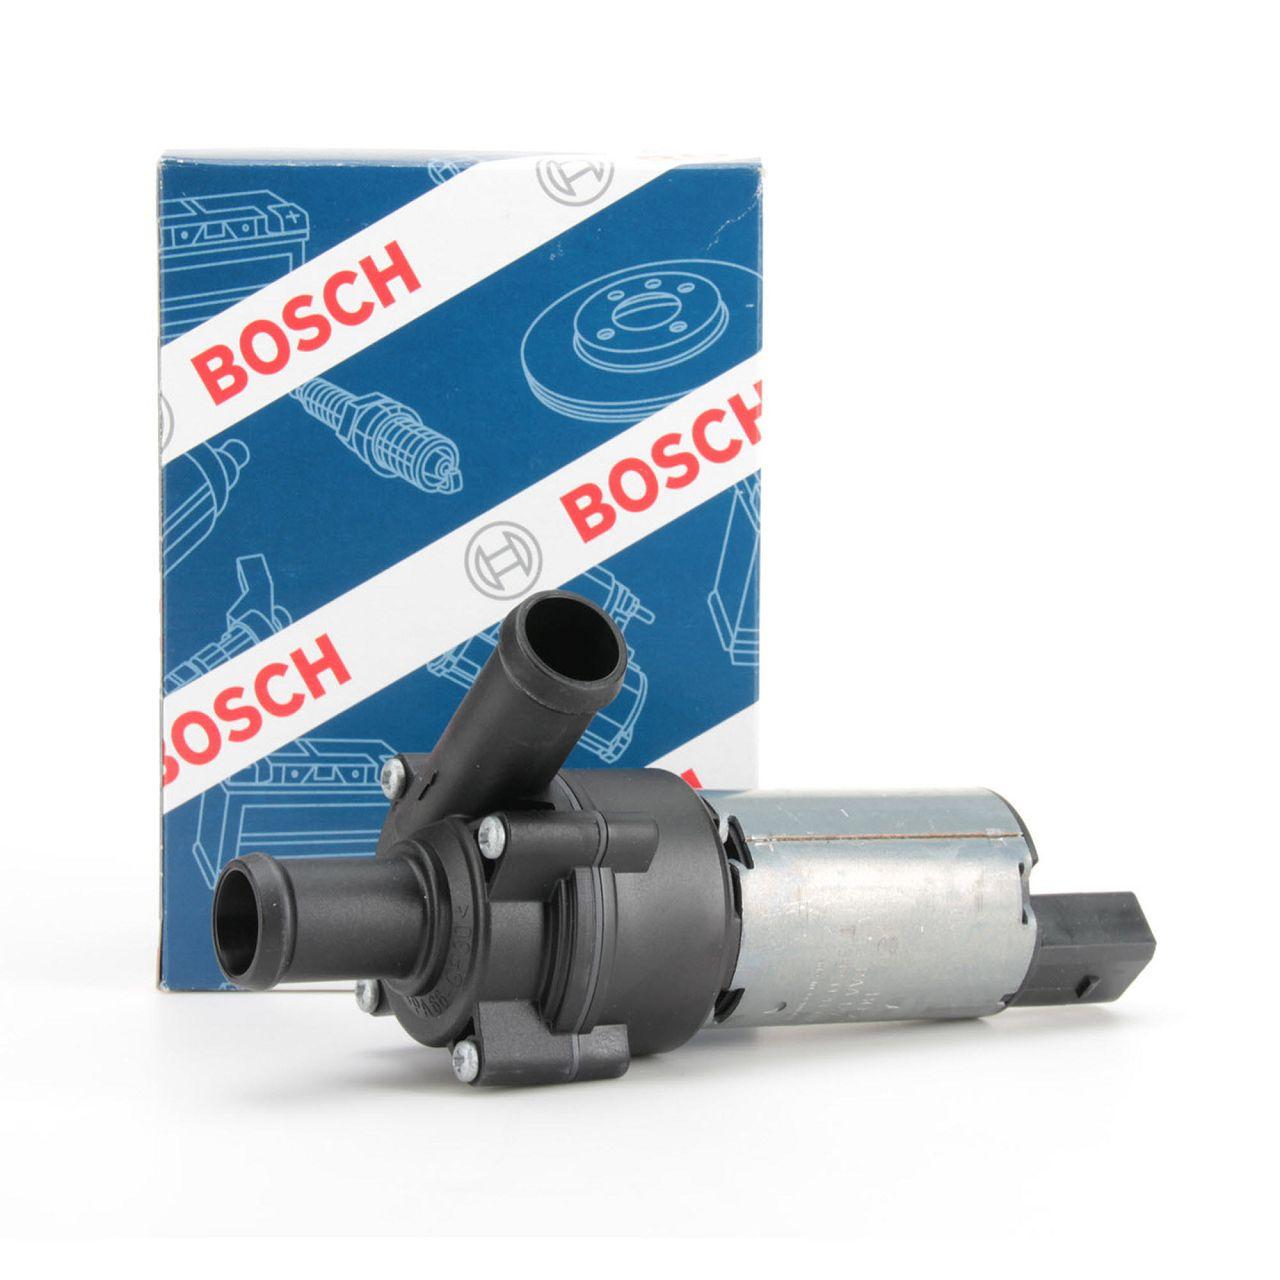 BOSCH Wasserumwälzpumpe Zusatzpumpe für FORD GALAXY VW BORA SHARAN T4 3D0965561D